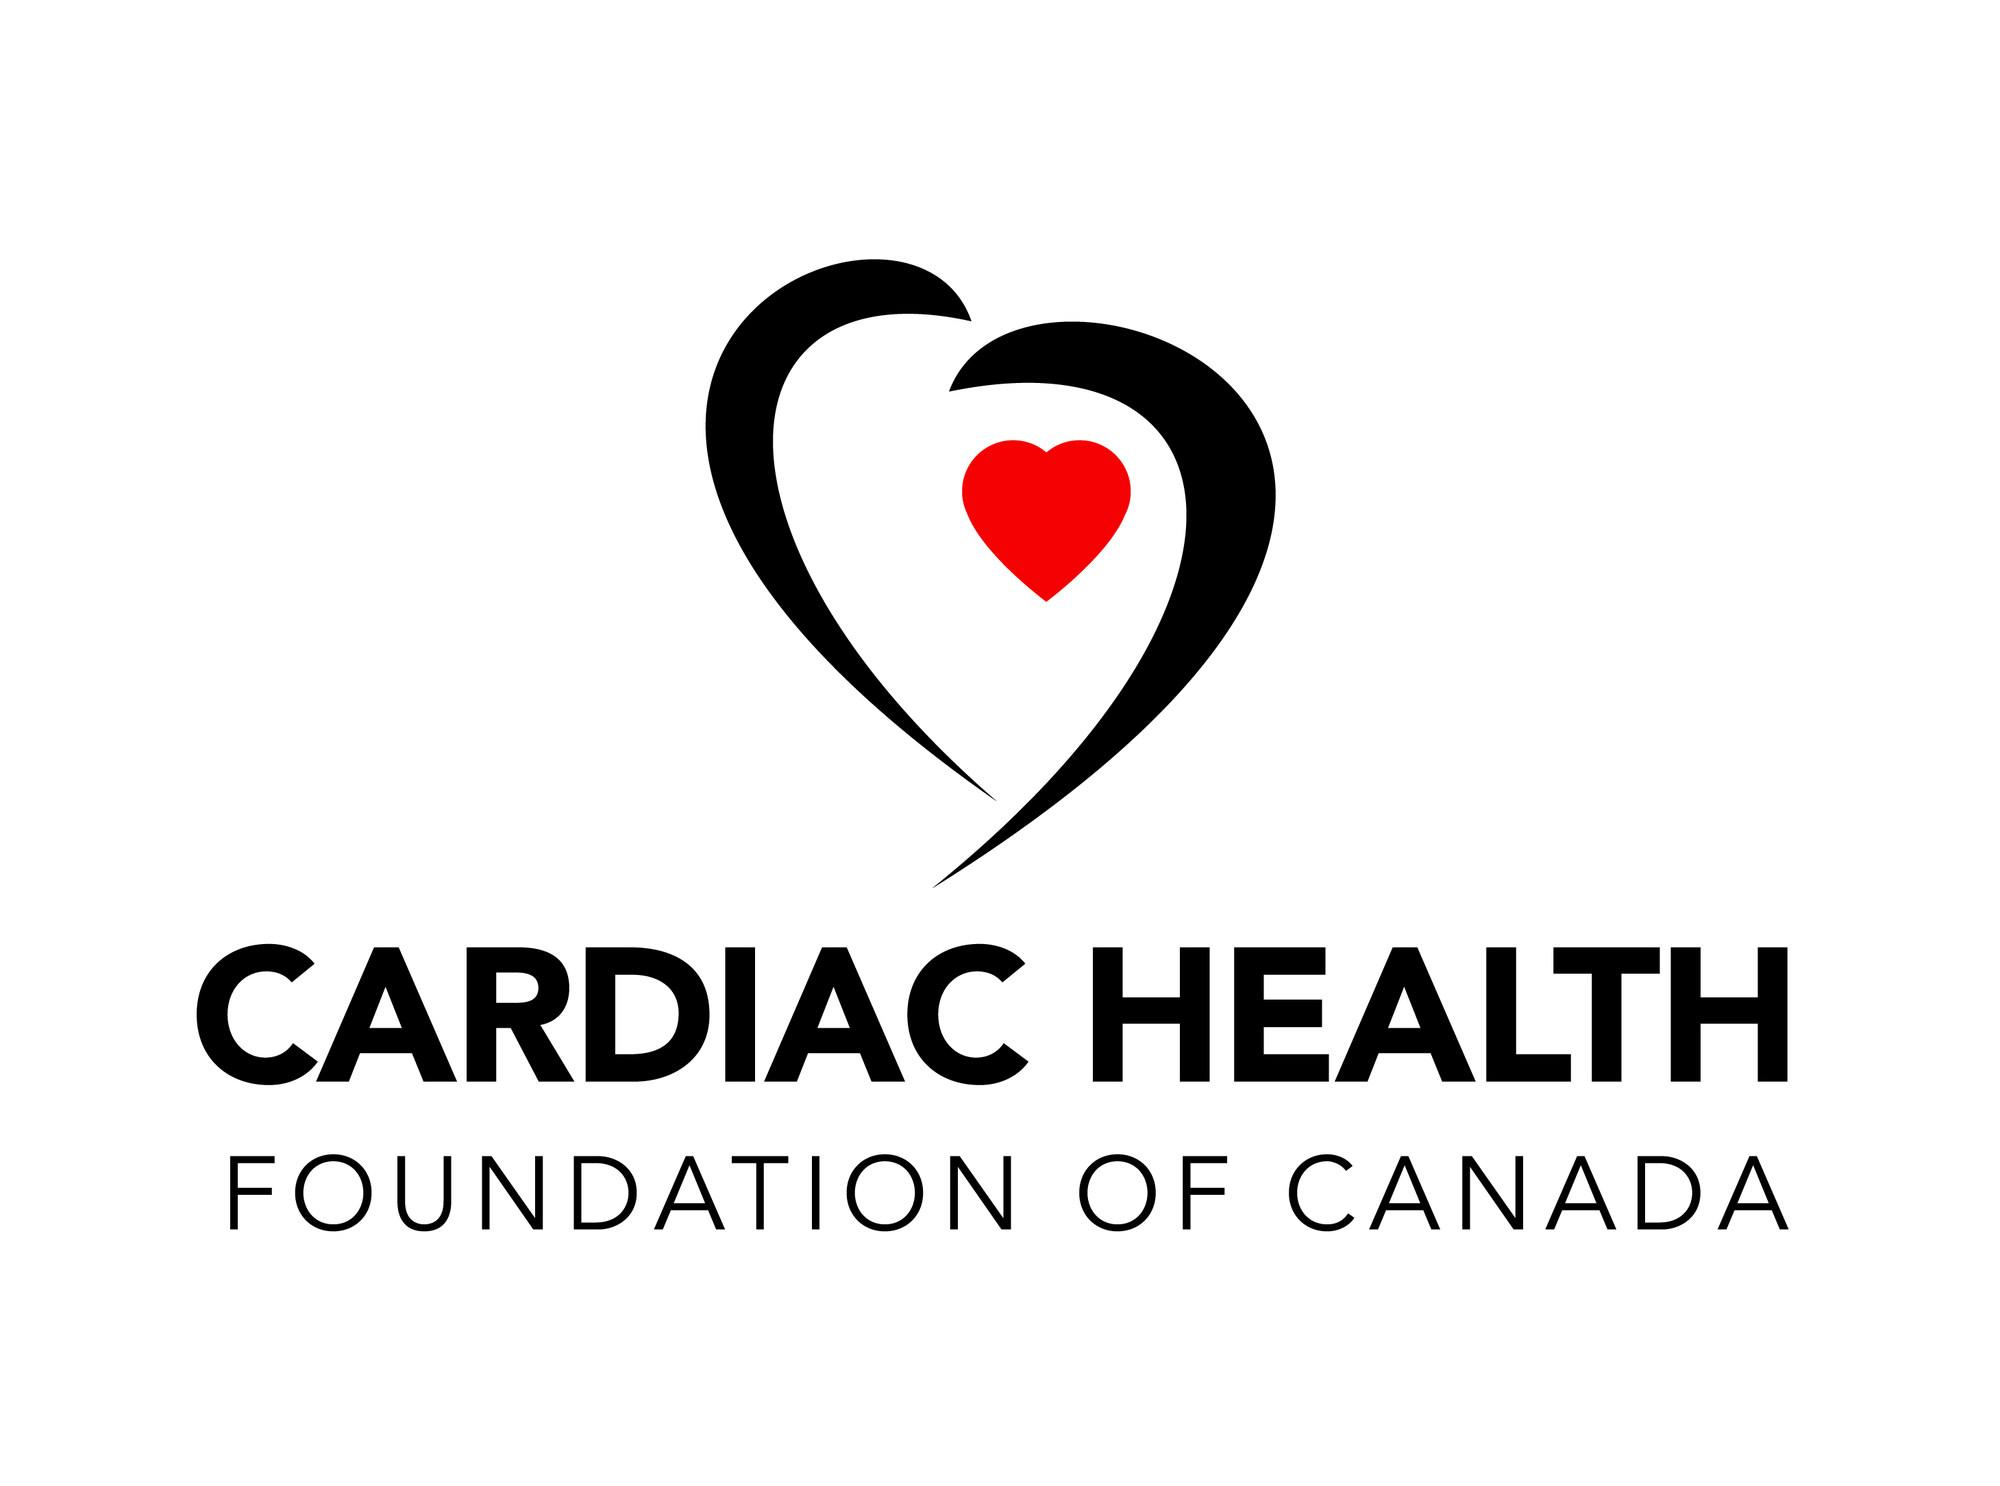 CARDIAC HEALTH WALK OF LIFE